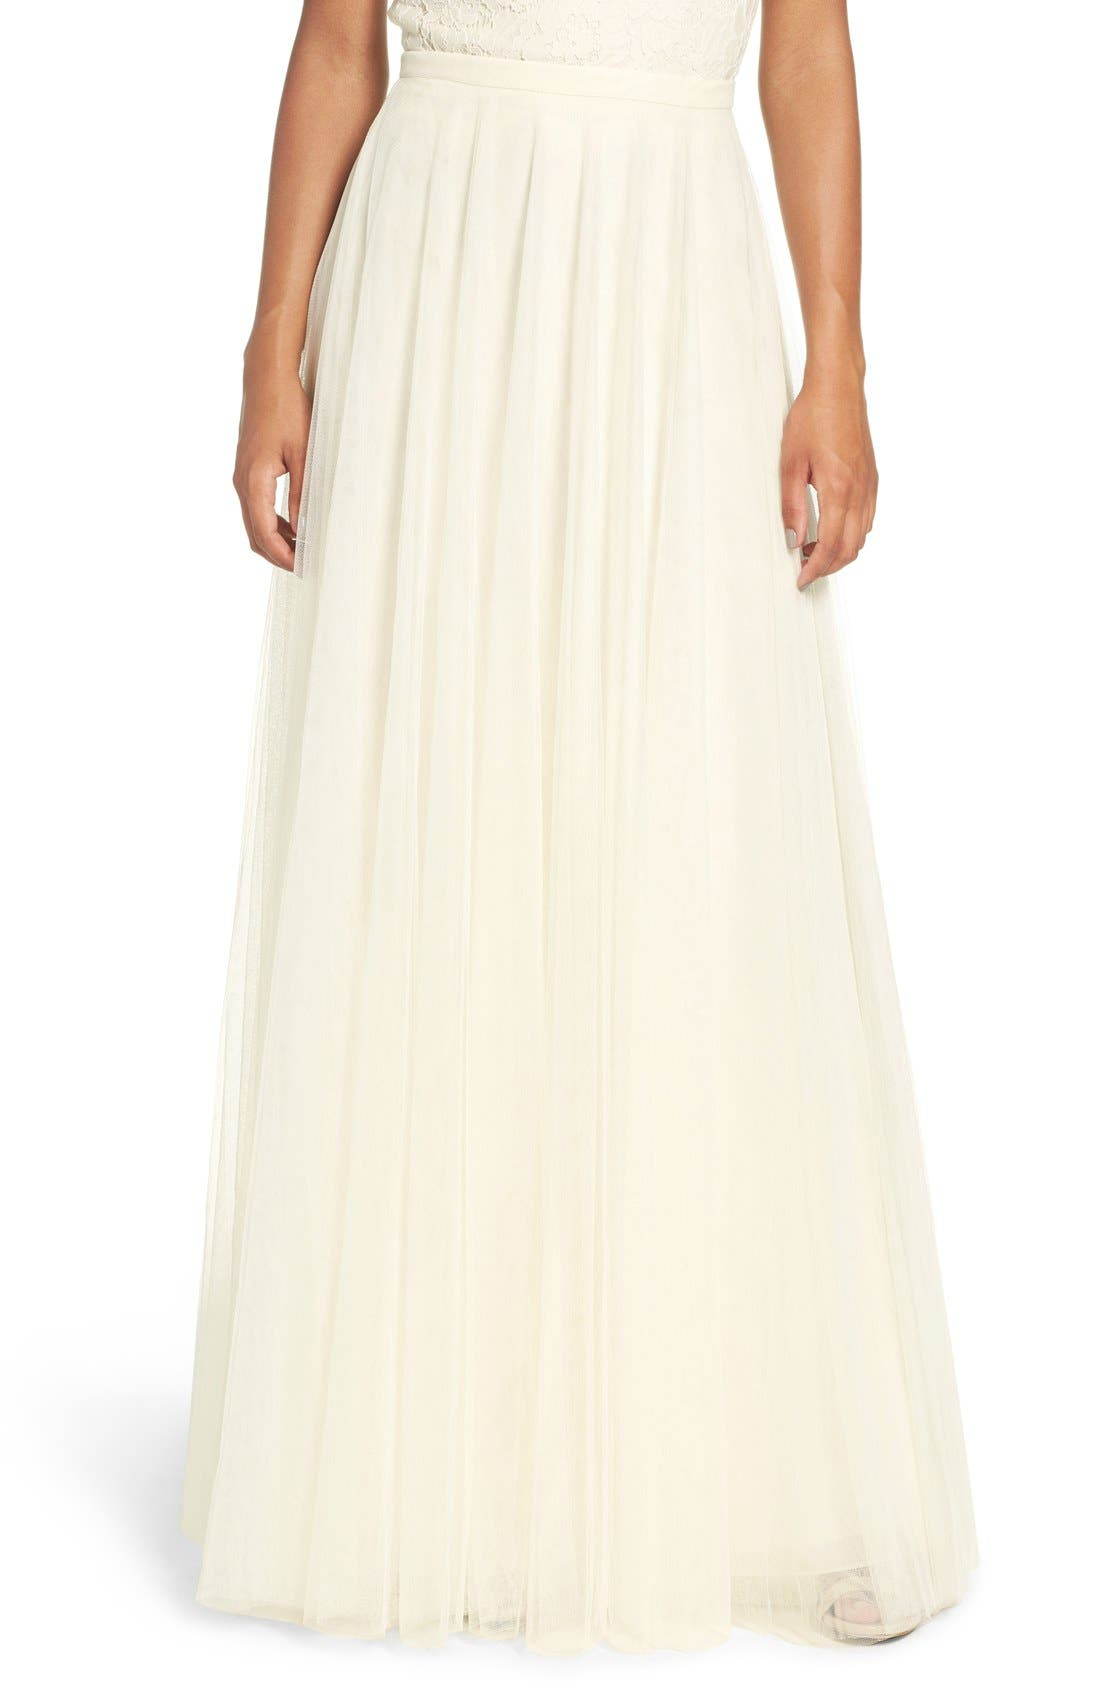 Winslow Long Tulle A-Line Skirt,                             Main thumbnail 1, color,                             104